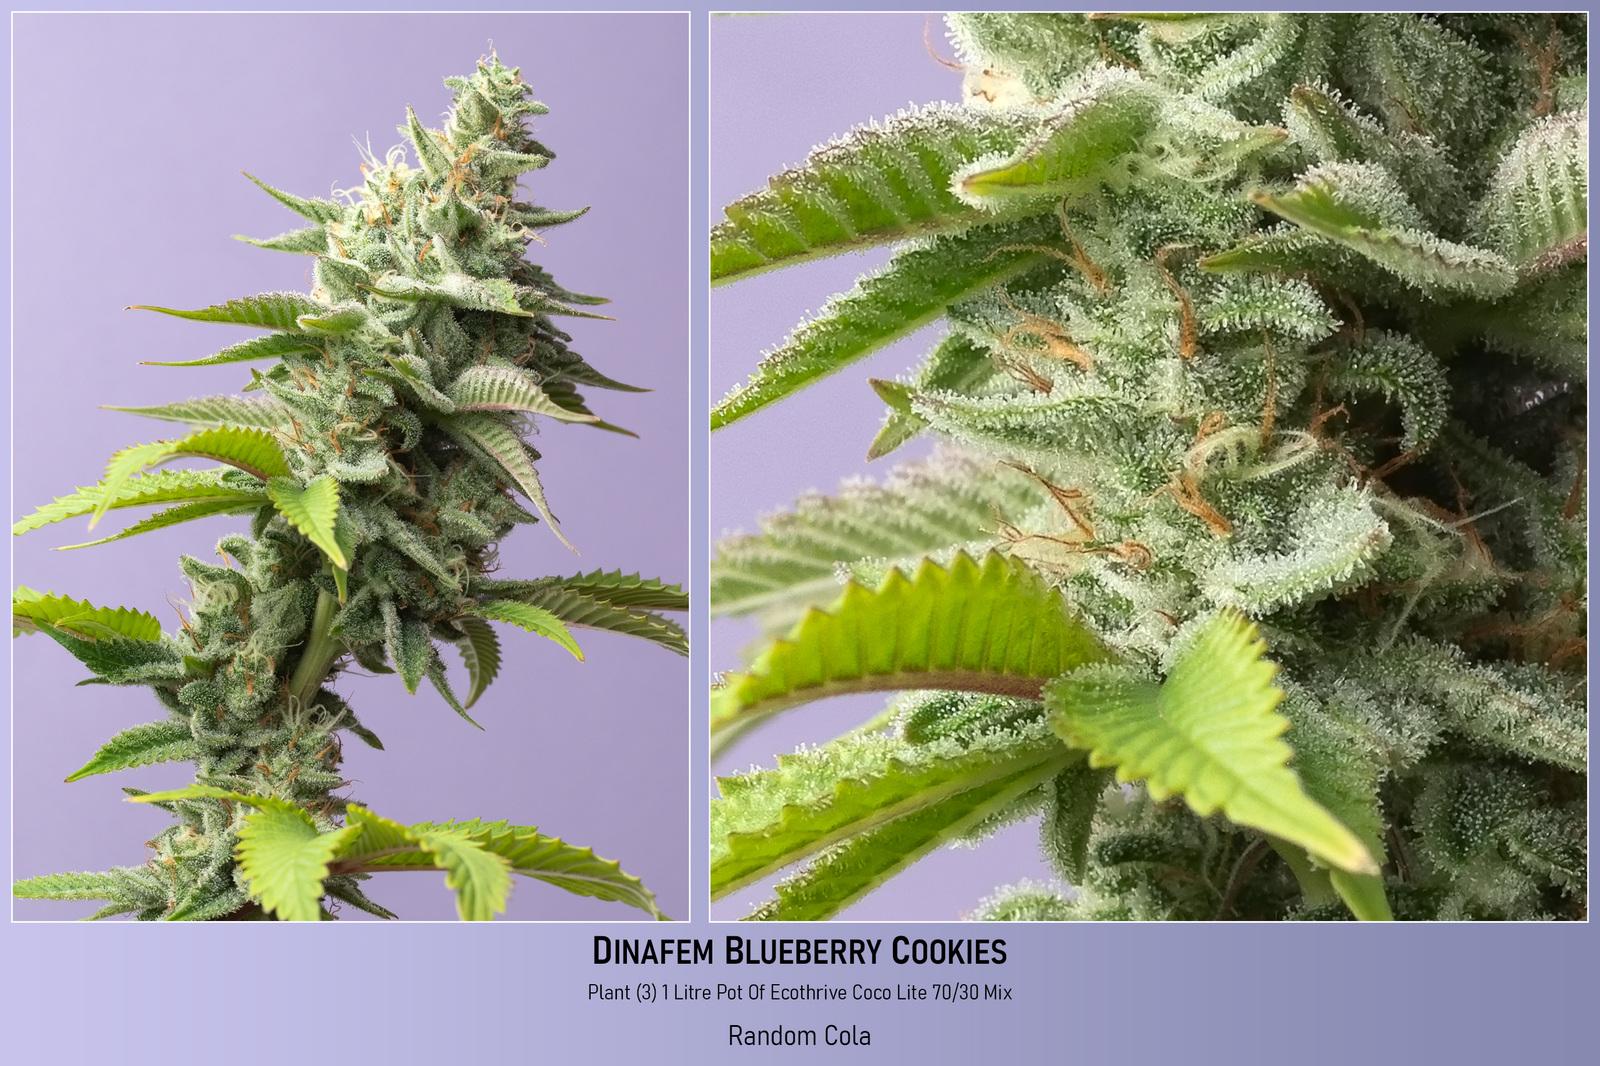 large.60350255e8a82_Dinafem-BlueBerryCookies-Plant3-1LitrePotOfCocoPerlite-RandomCola-23-02-2021.jpg